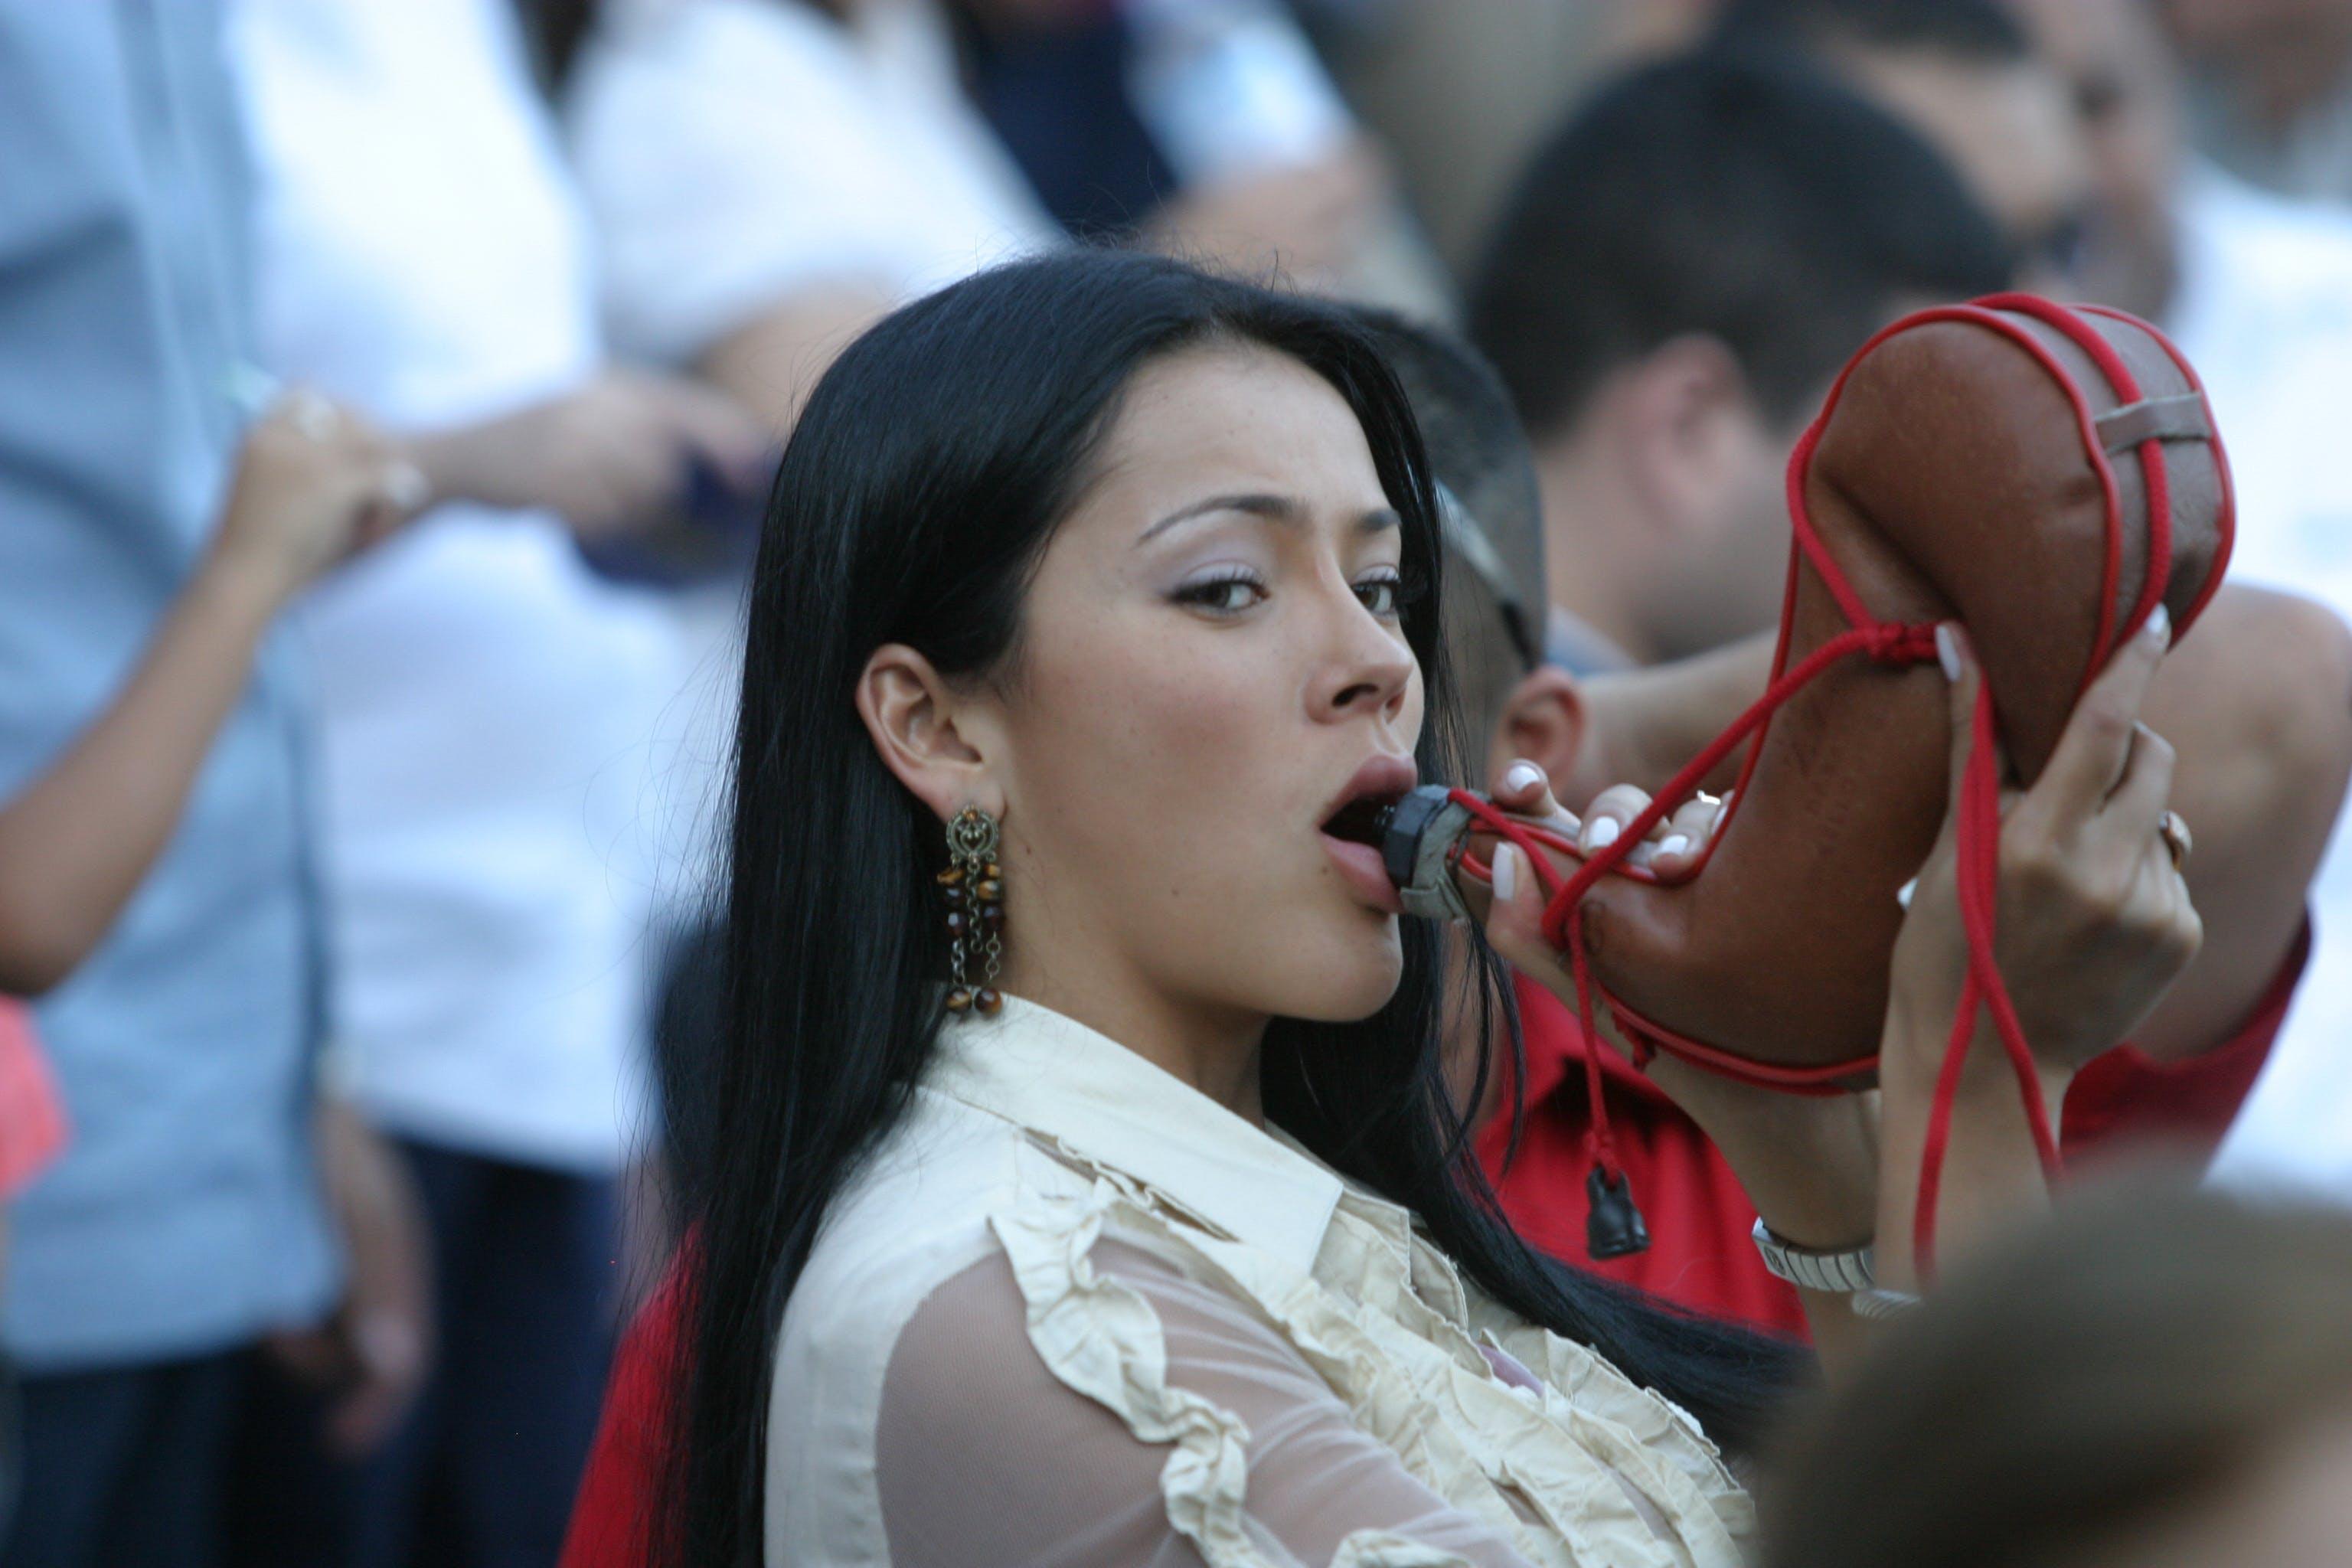 Free stock photo of Colombian, drinking, latina